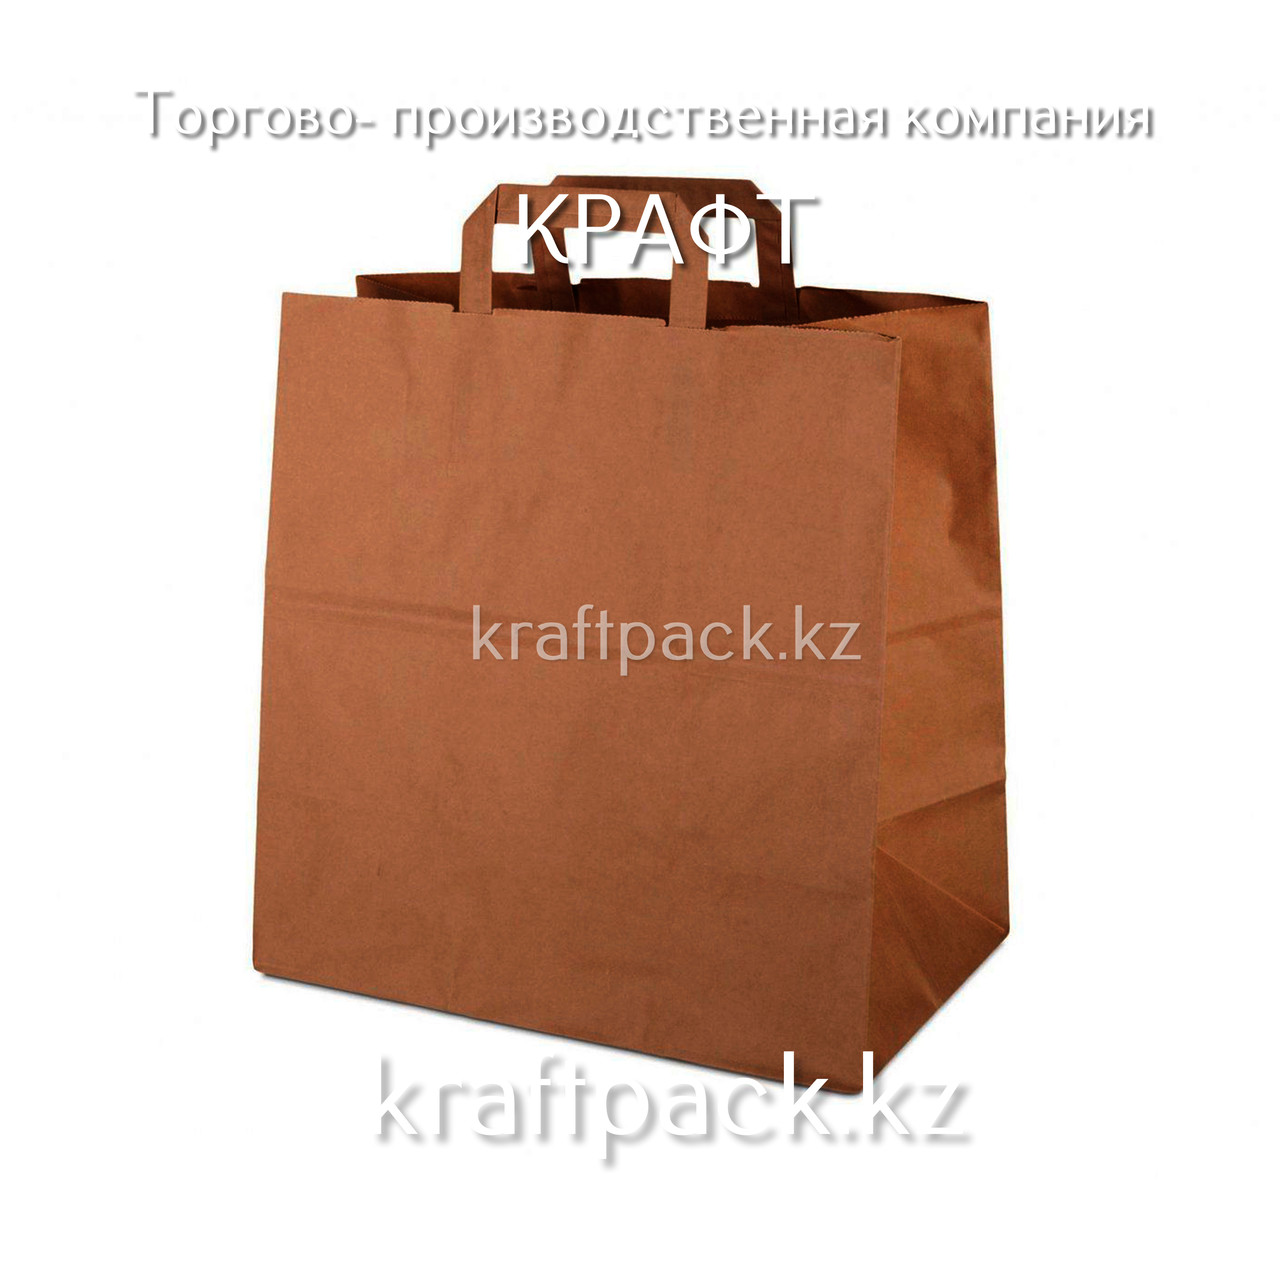 Бумажный крафт пакет, бурый с ПЛОСКОЙ ручкой 80гр 320*200*320 (250шт/кор)